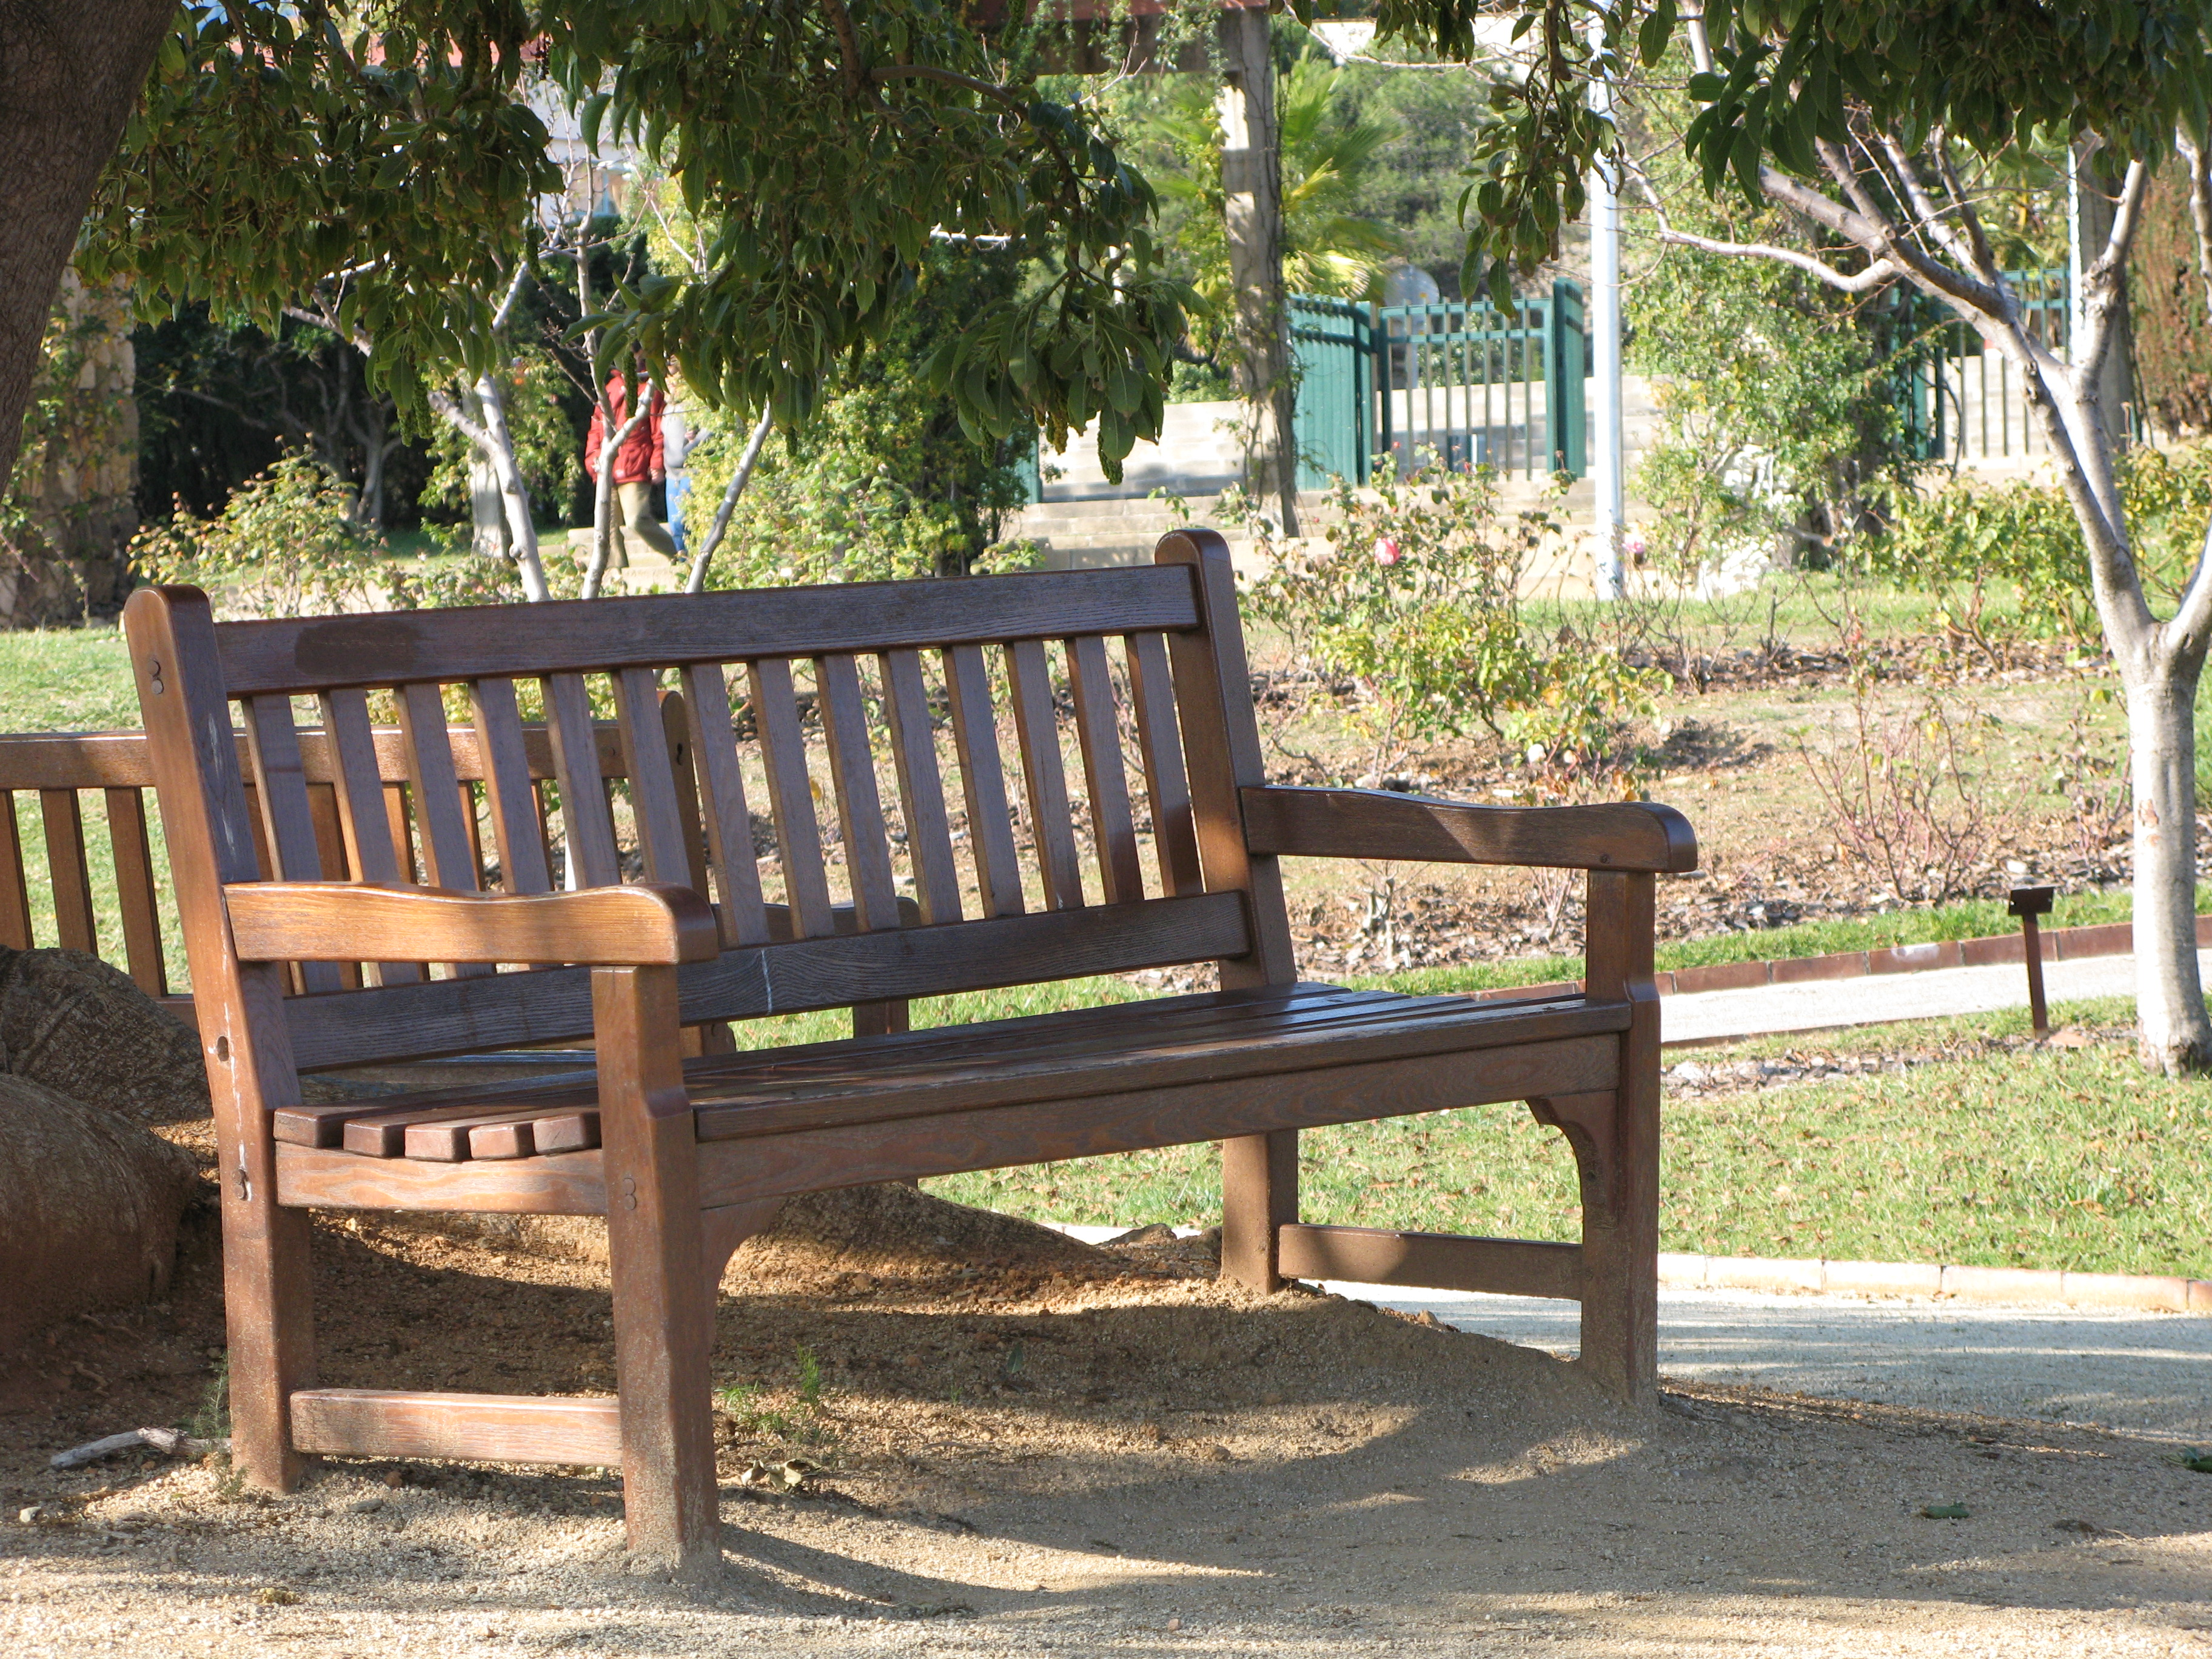 bench-in-a-quiet-corner-1381837